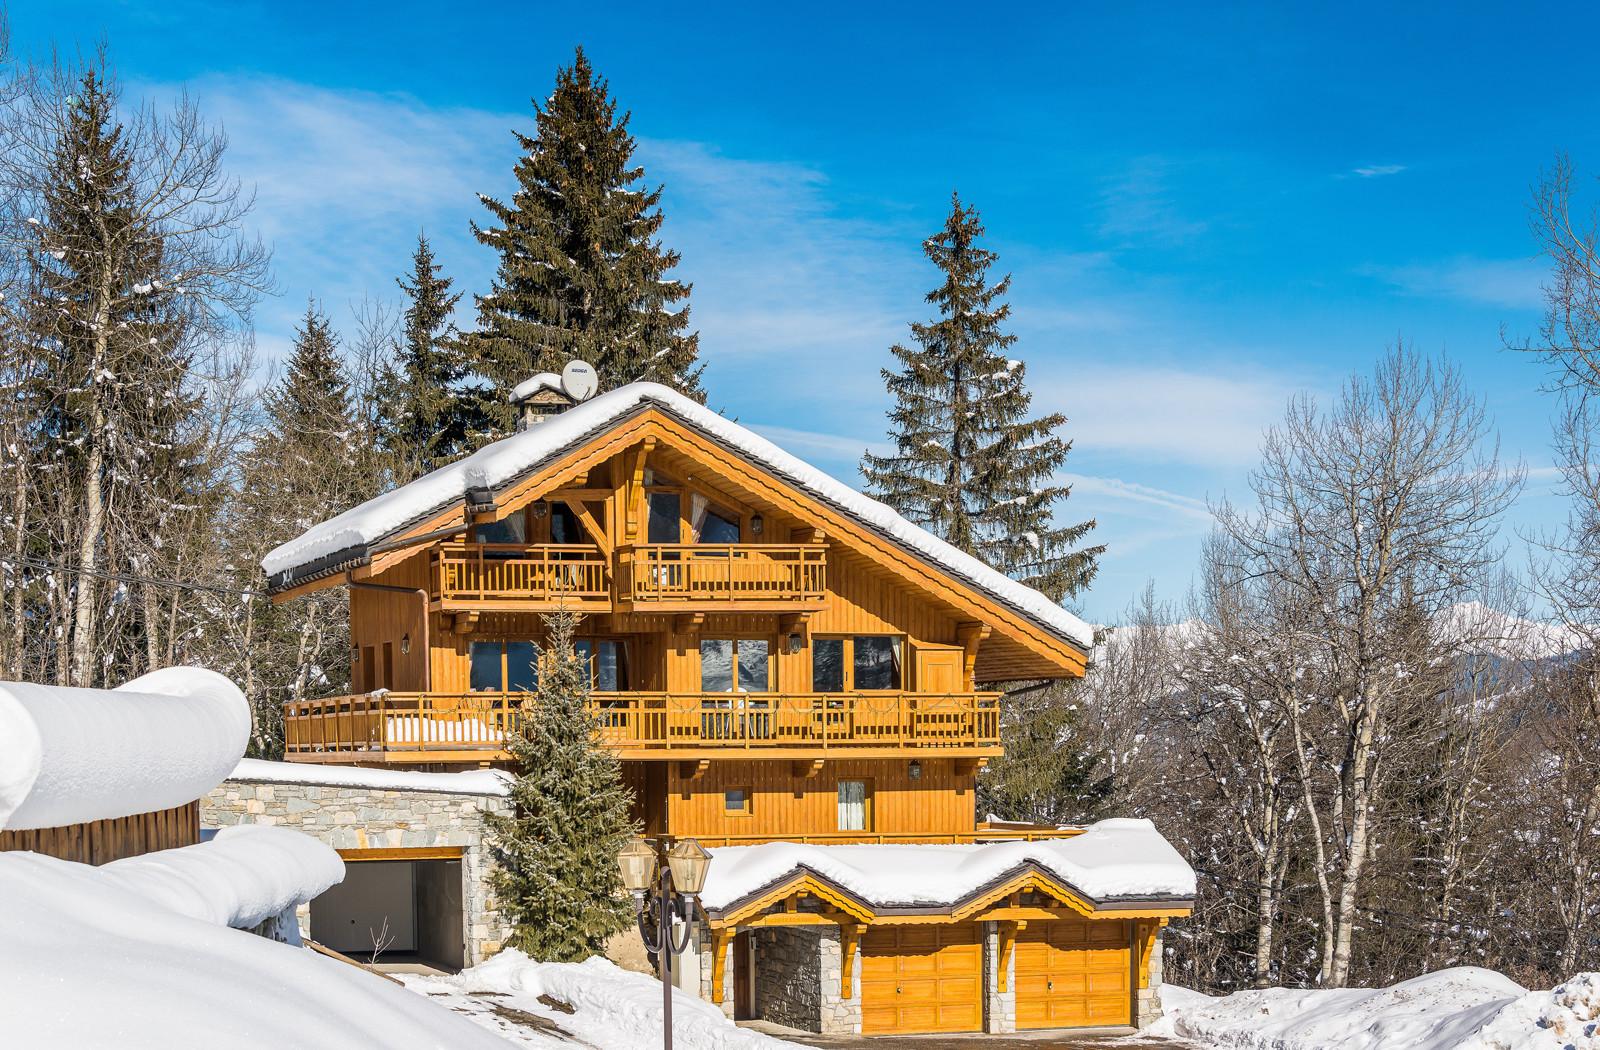 Kings-avenue-méribel-snow-sauna-indoor-jacuzzi-hammam-parking-cinema-boot-heaters-fireplace-large-terrace-area-méribel-018